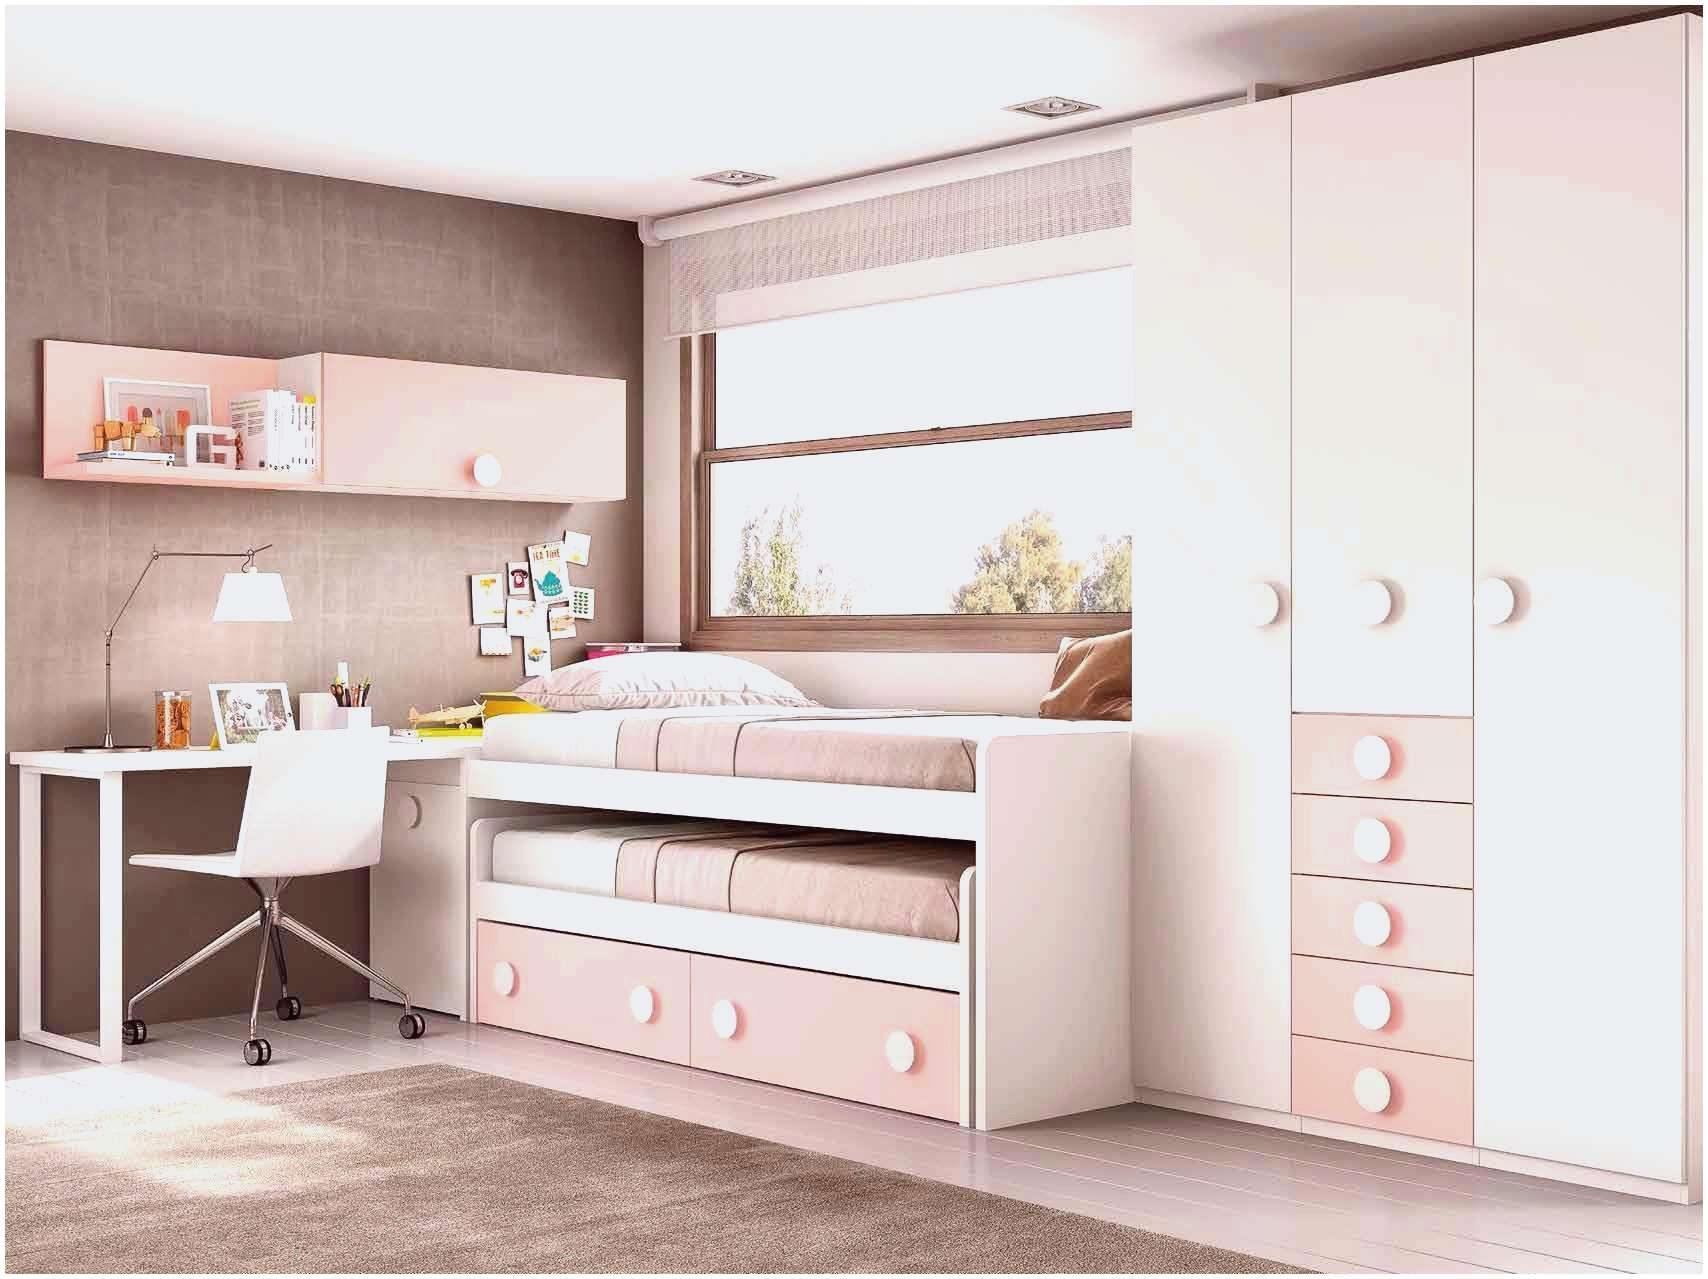 Lit Ado Pas Cher Belle Luxe Lit Ado Design Pouf Chambre Ado Frais Pouf Design Pas Cher